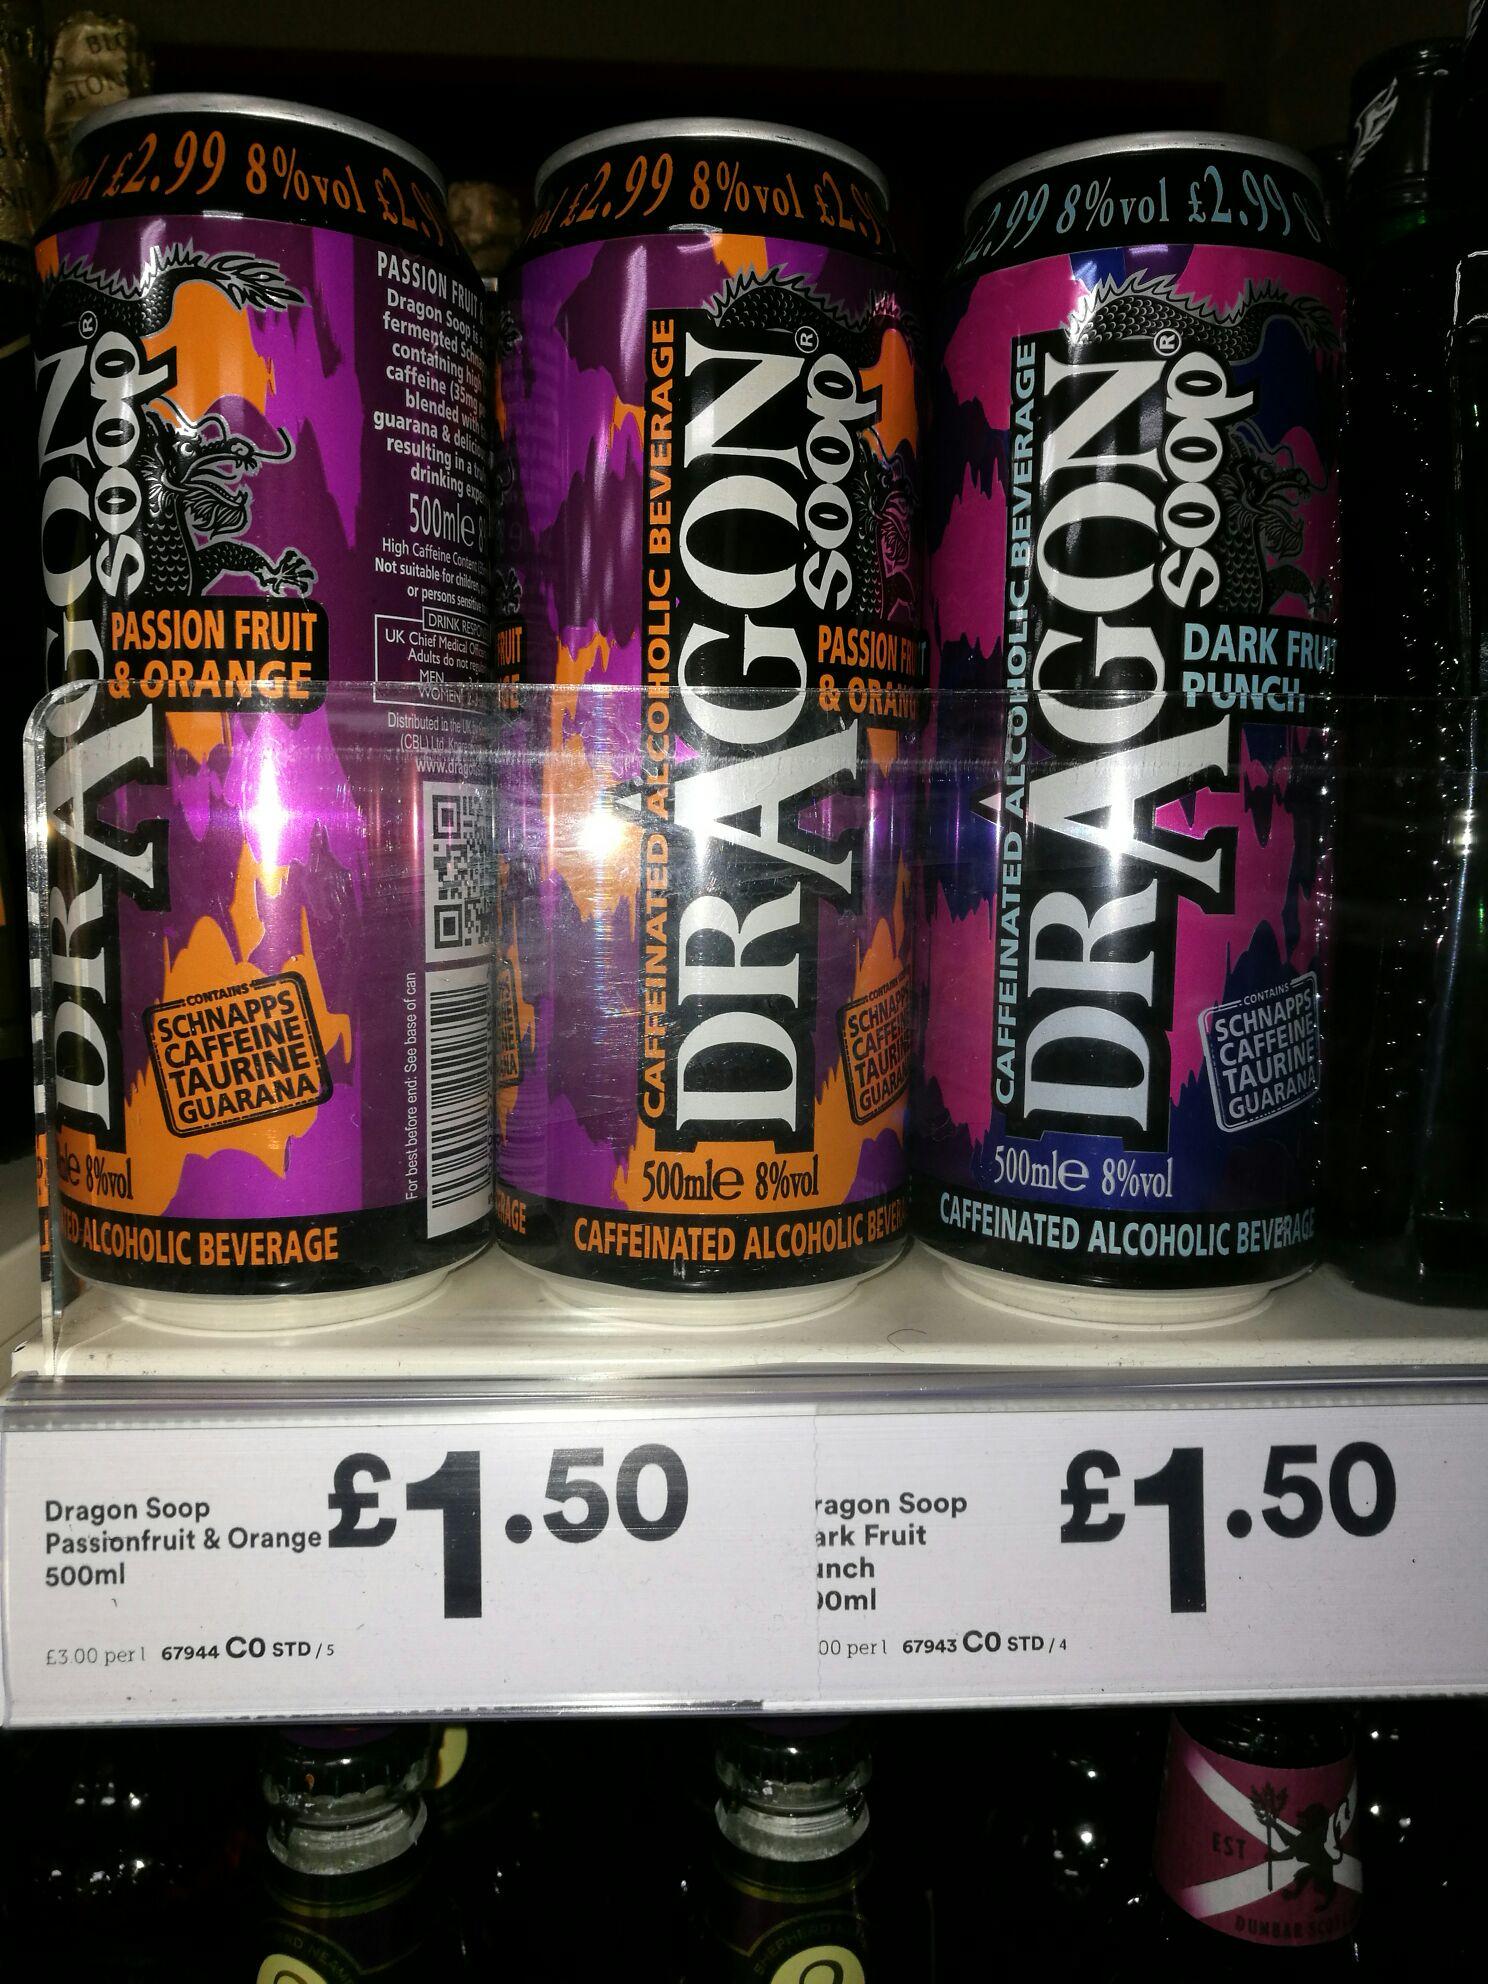 Dragonsoop £1.50 @ Iceland